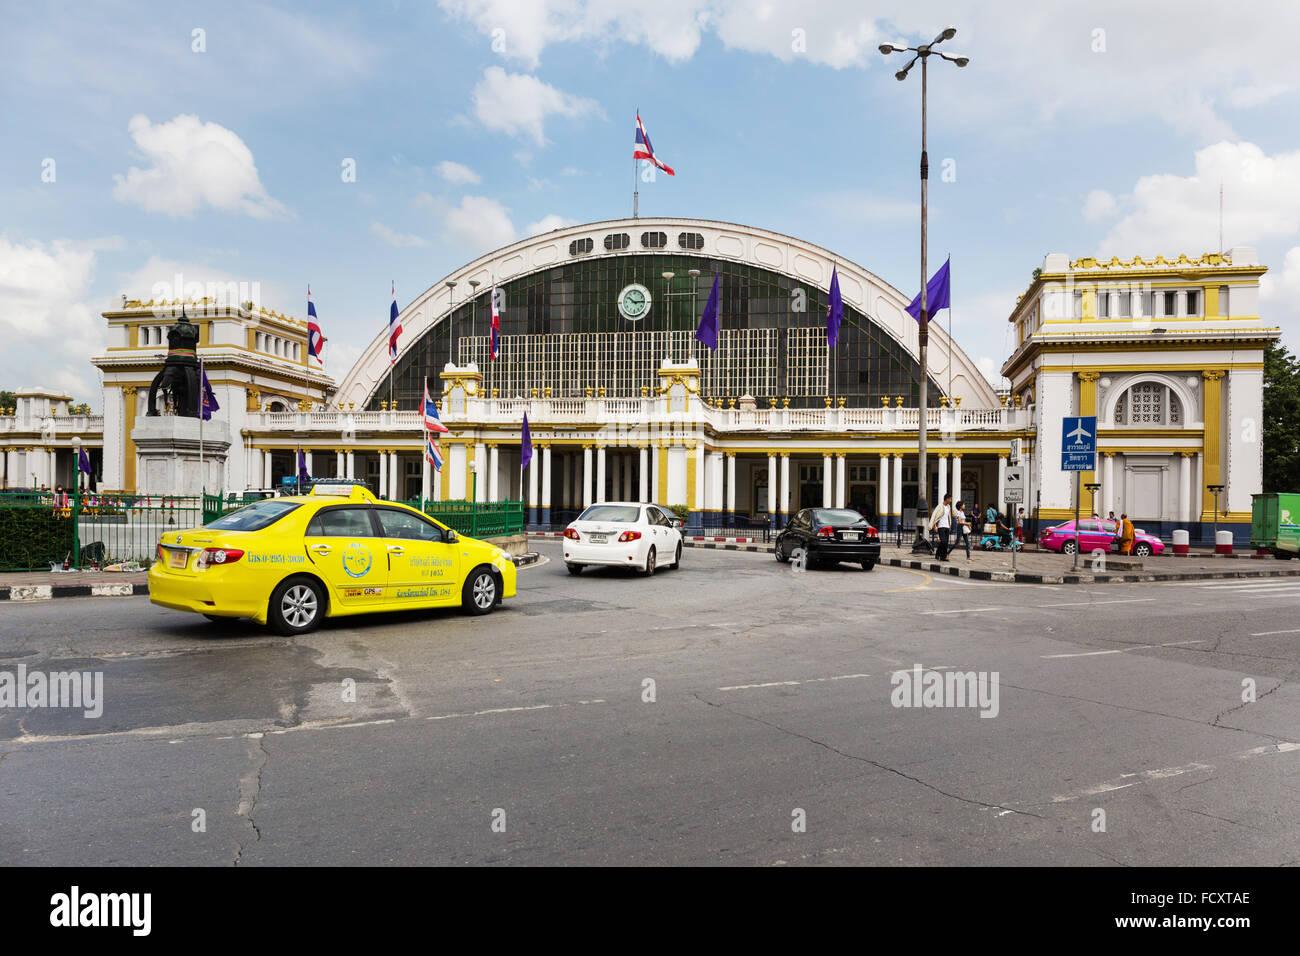 Taxi en face de la gare centrale, la gare de Hua Lamphong, Chinatown, Bangkok, Thaïlande Photo Stock